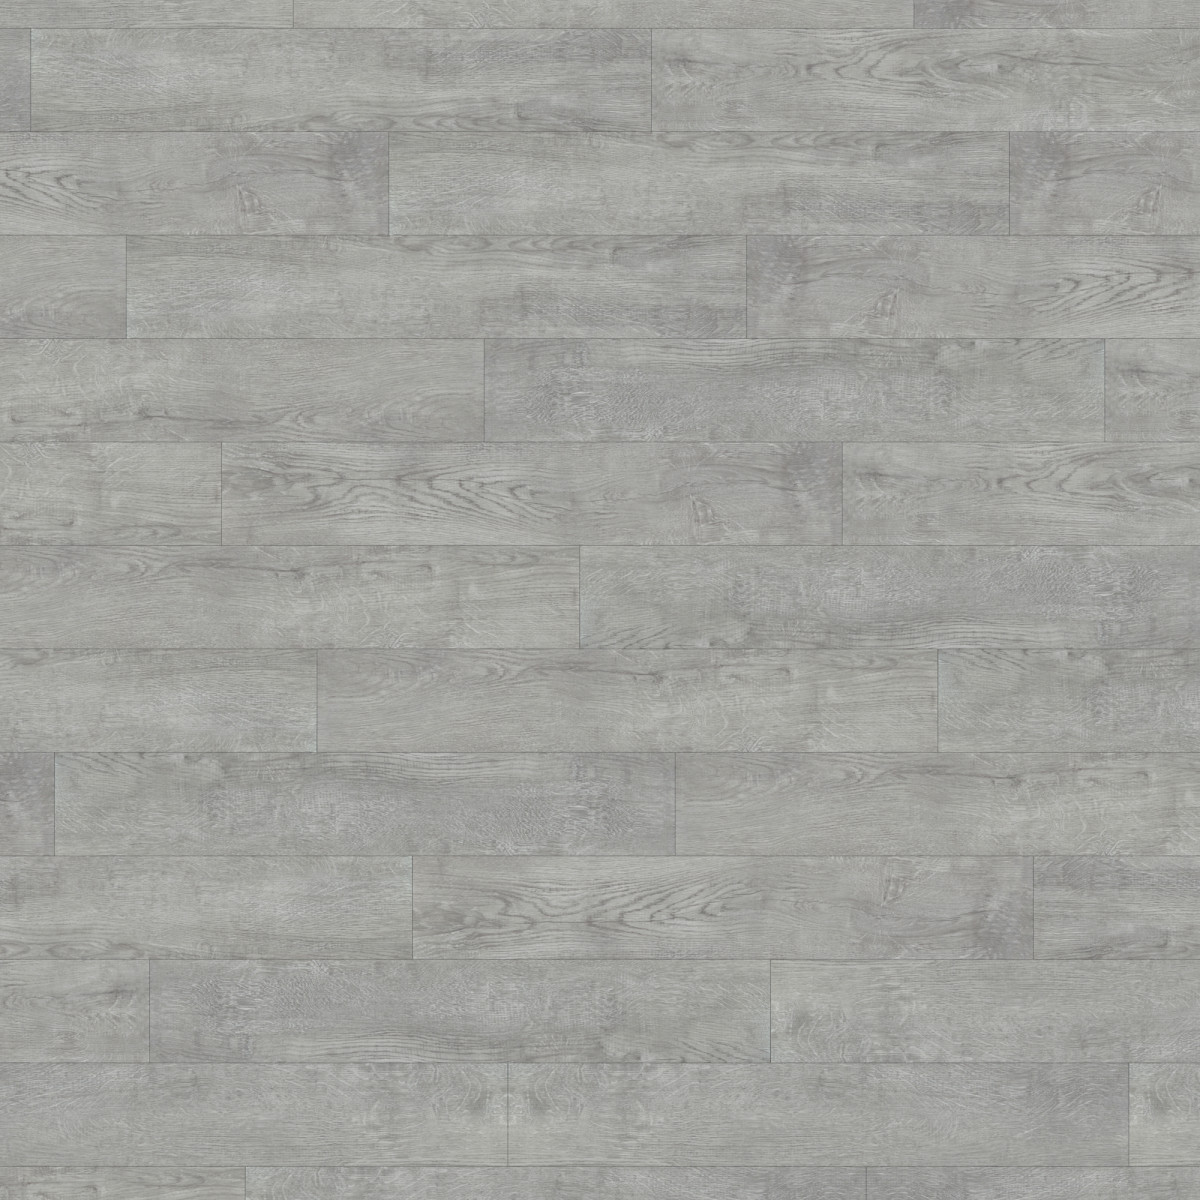 ПВХ плитка Artens Girraween 21 класс толщина 4 мм 1.41 м²